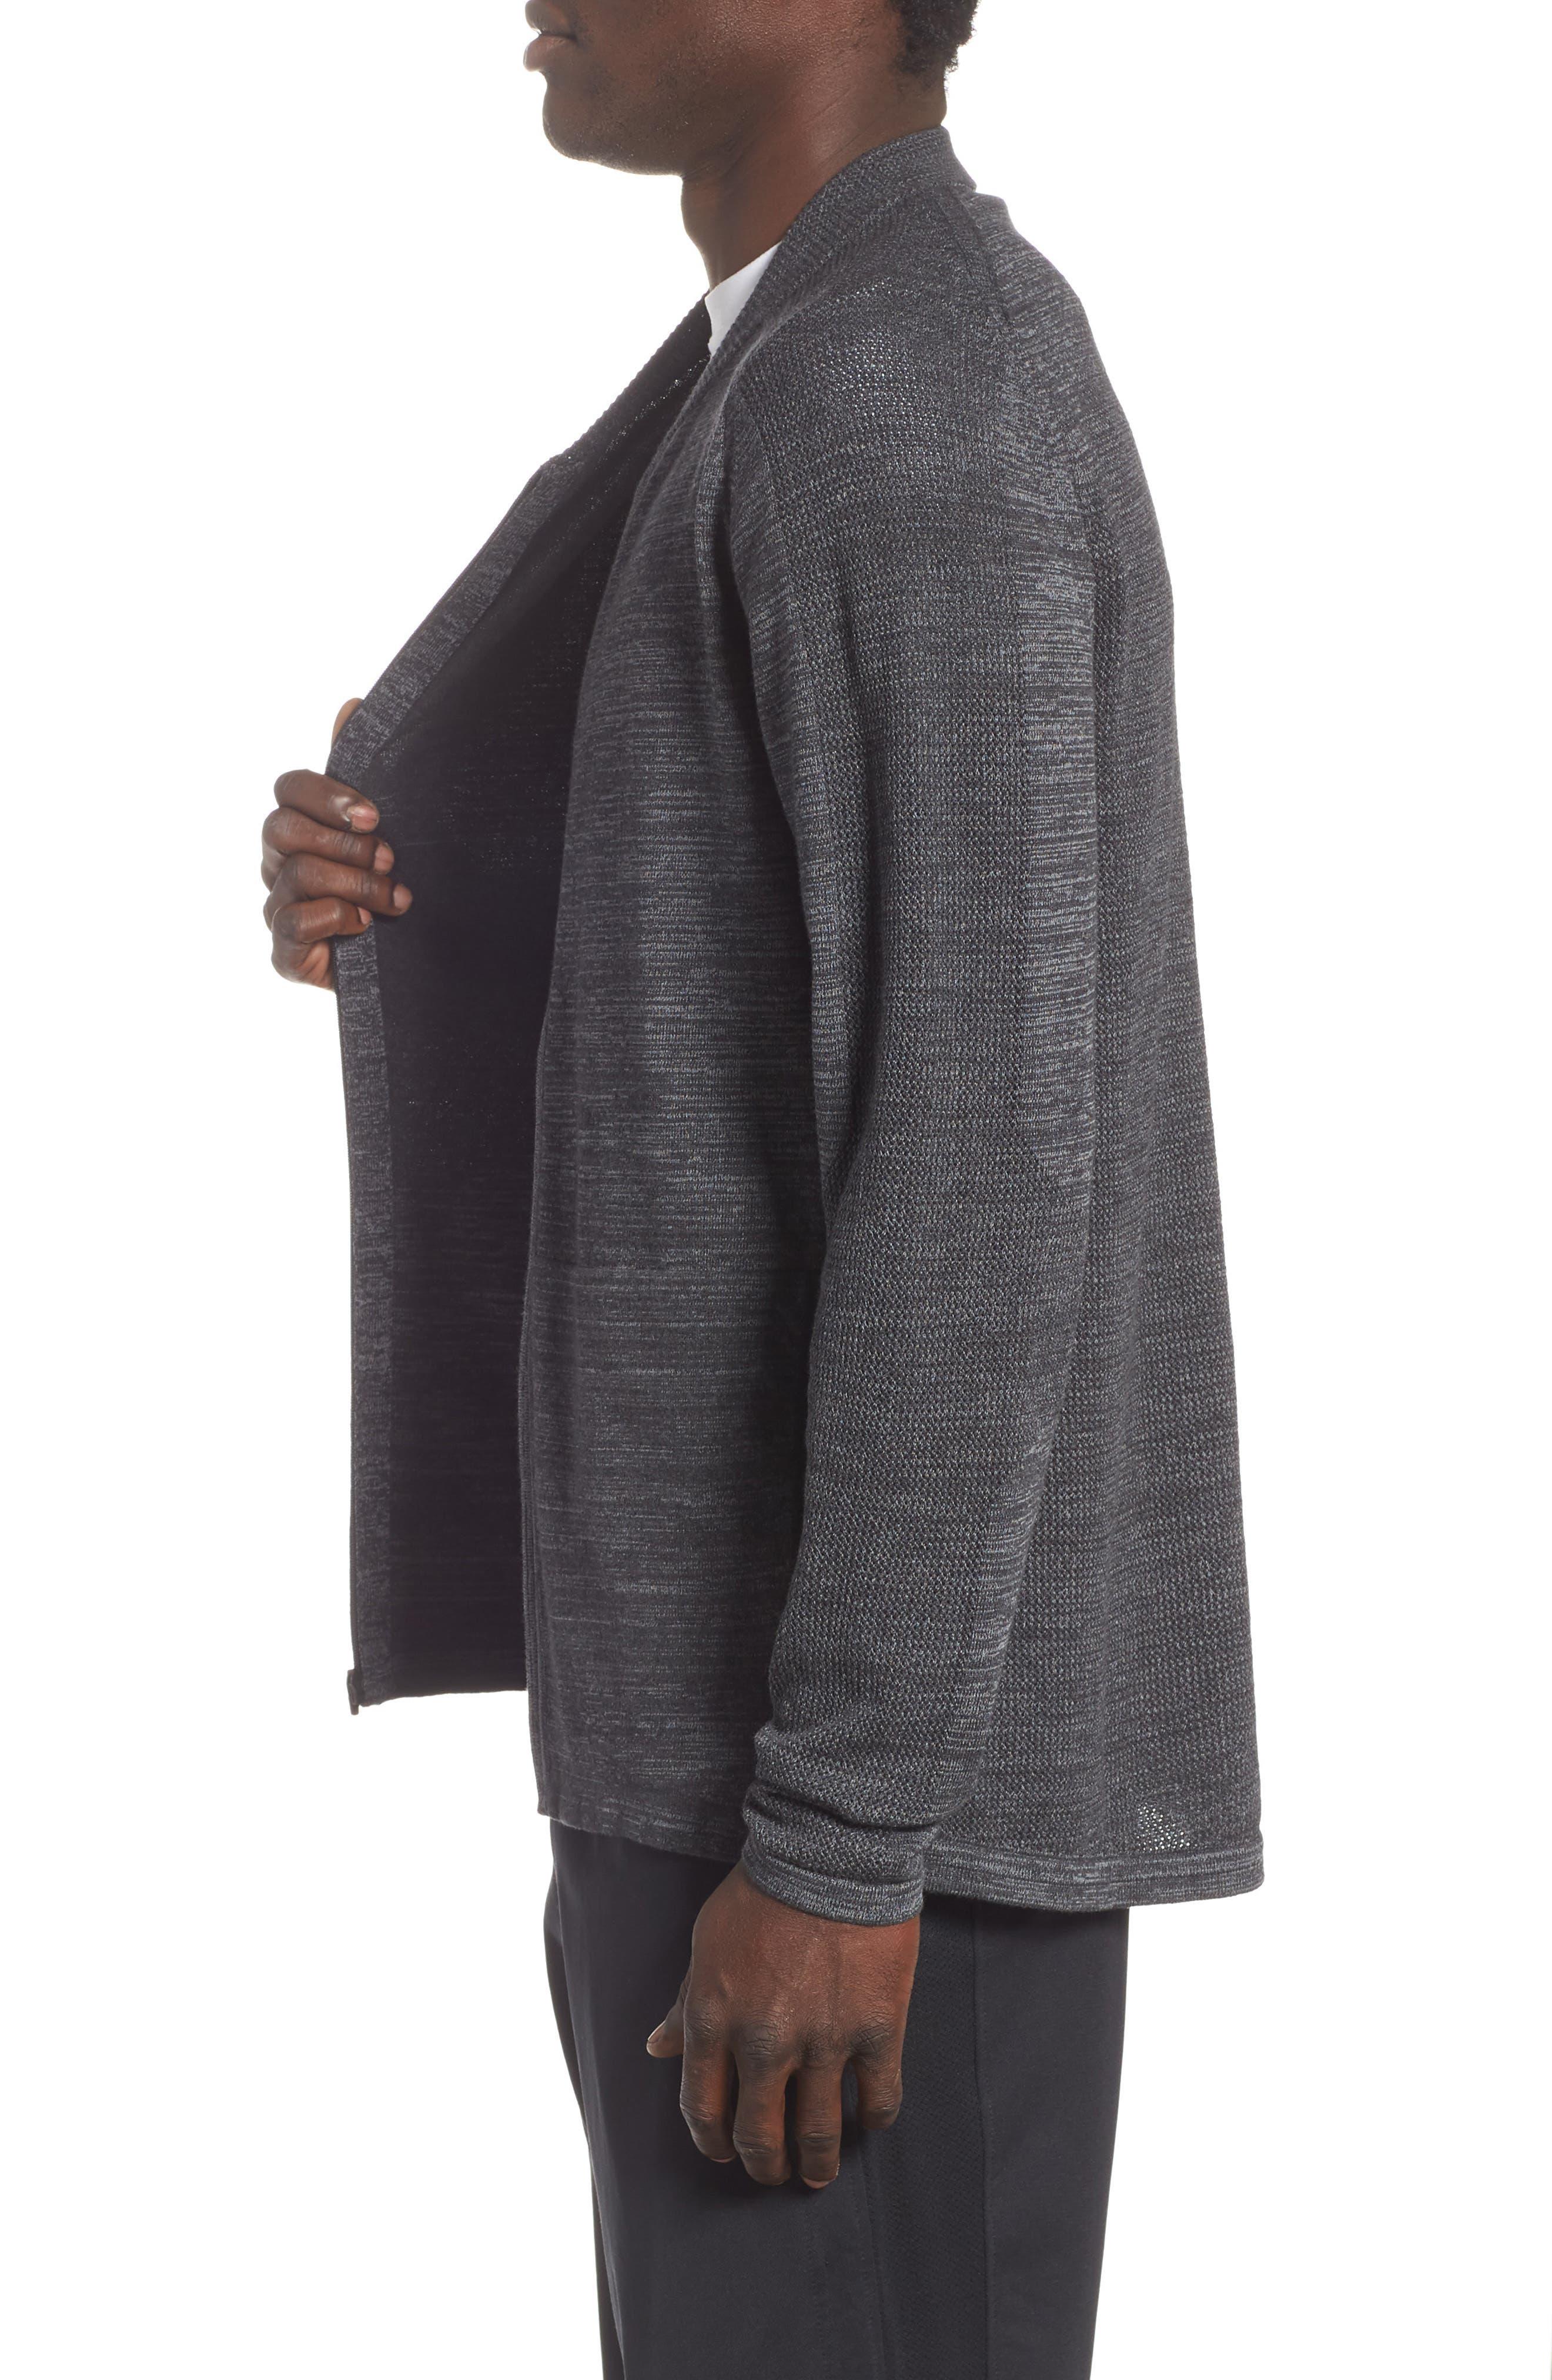 Tech Sweater Baseball Jacket,                             Alternate thumbnail 3, color,                             BLACK OXIDE SPACEDYE